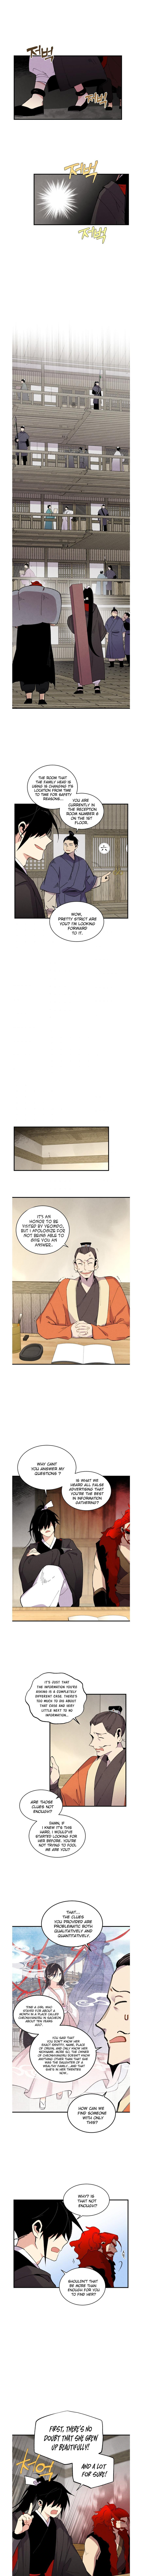 Lightning Degree Chapter 68 page 5 - Mangakakalots.com